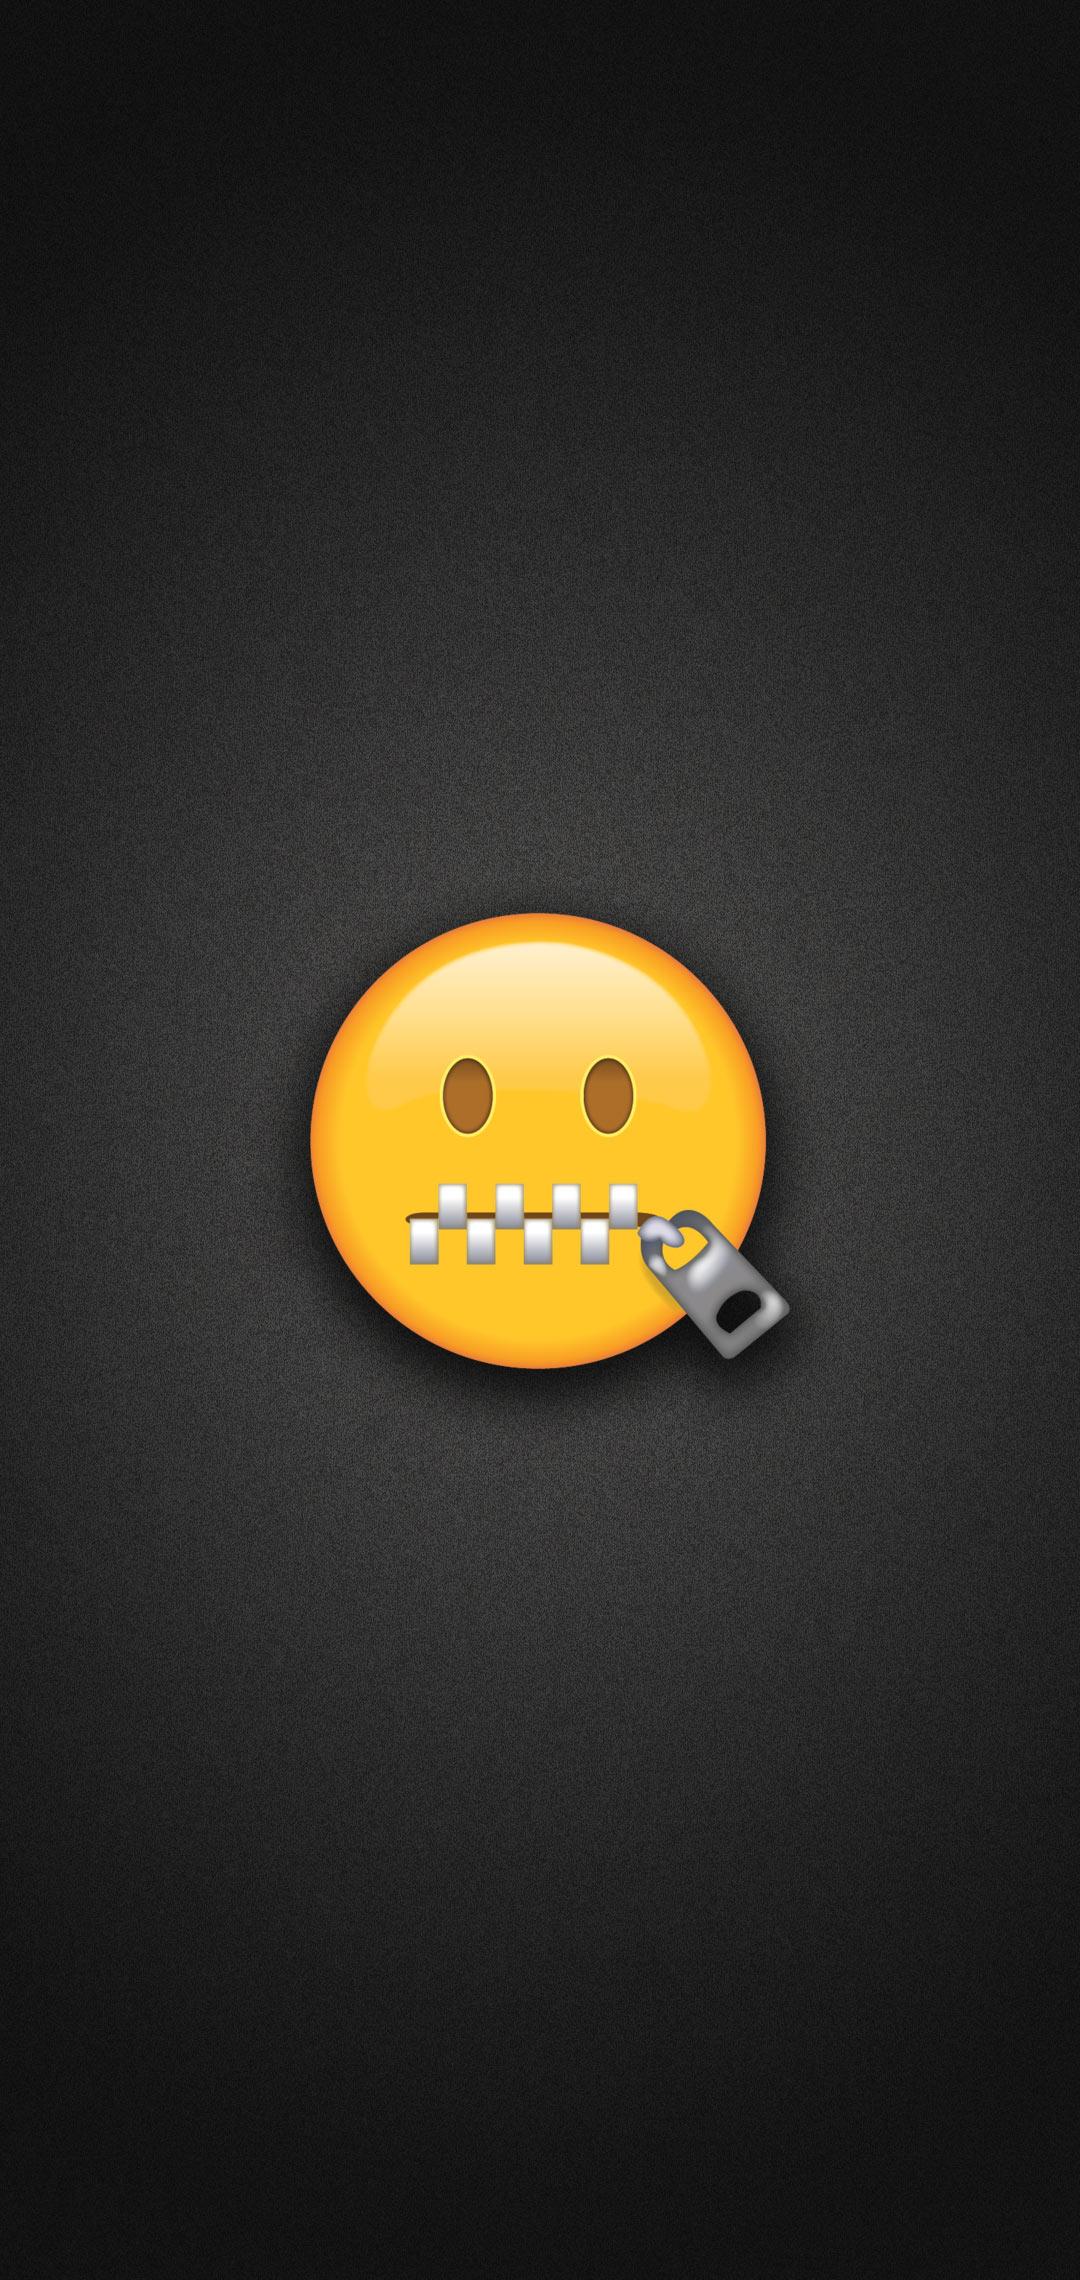 Zipper Mouth Face Emoji Phone Wallpaper